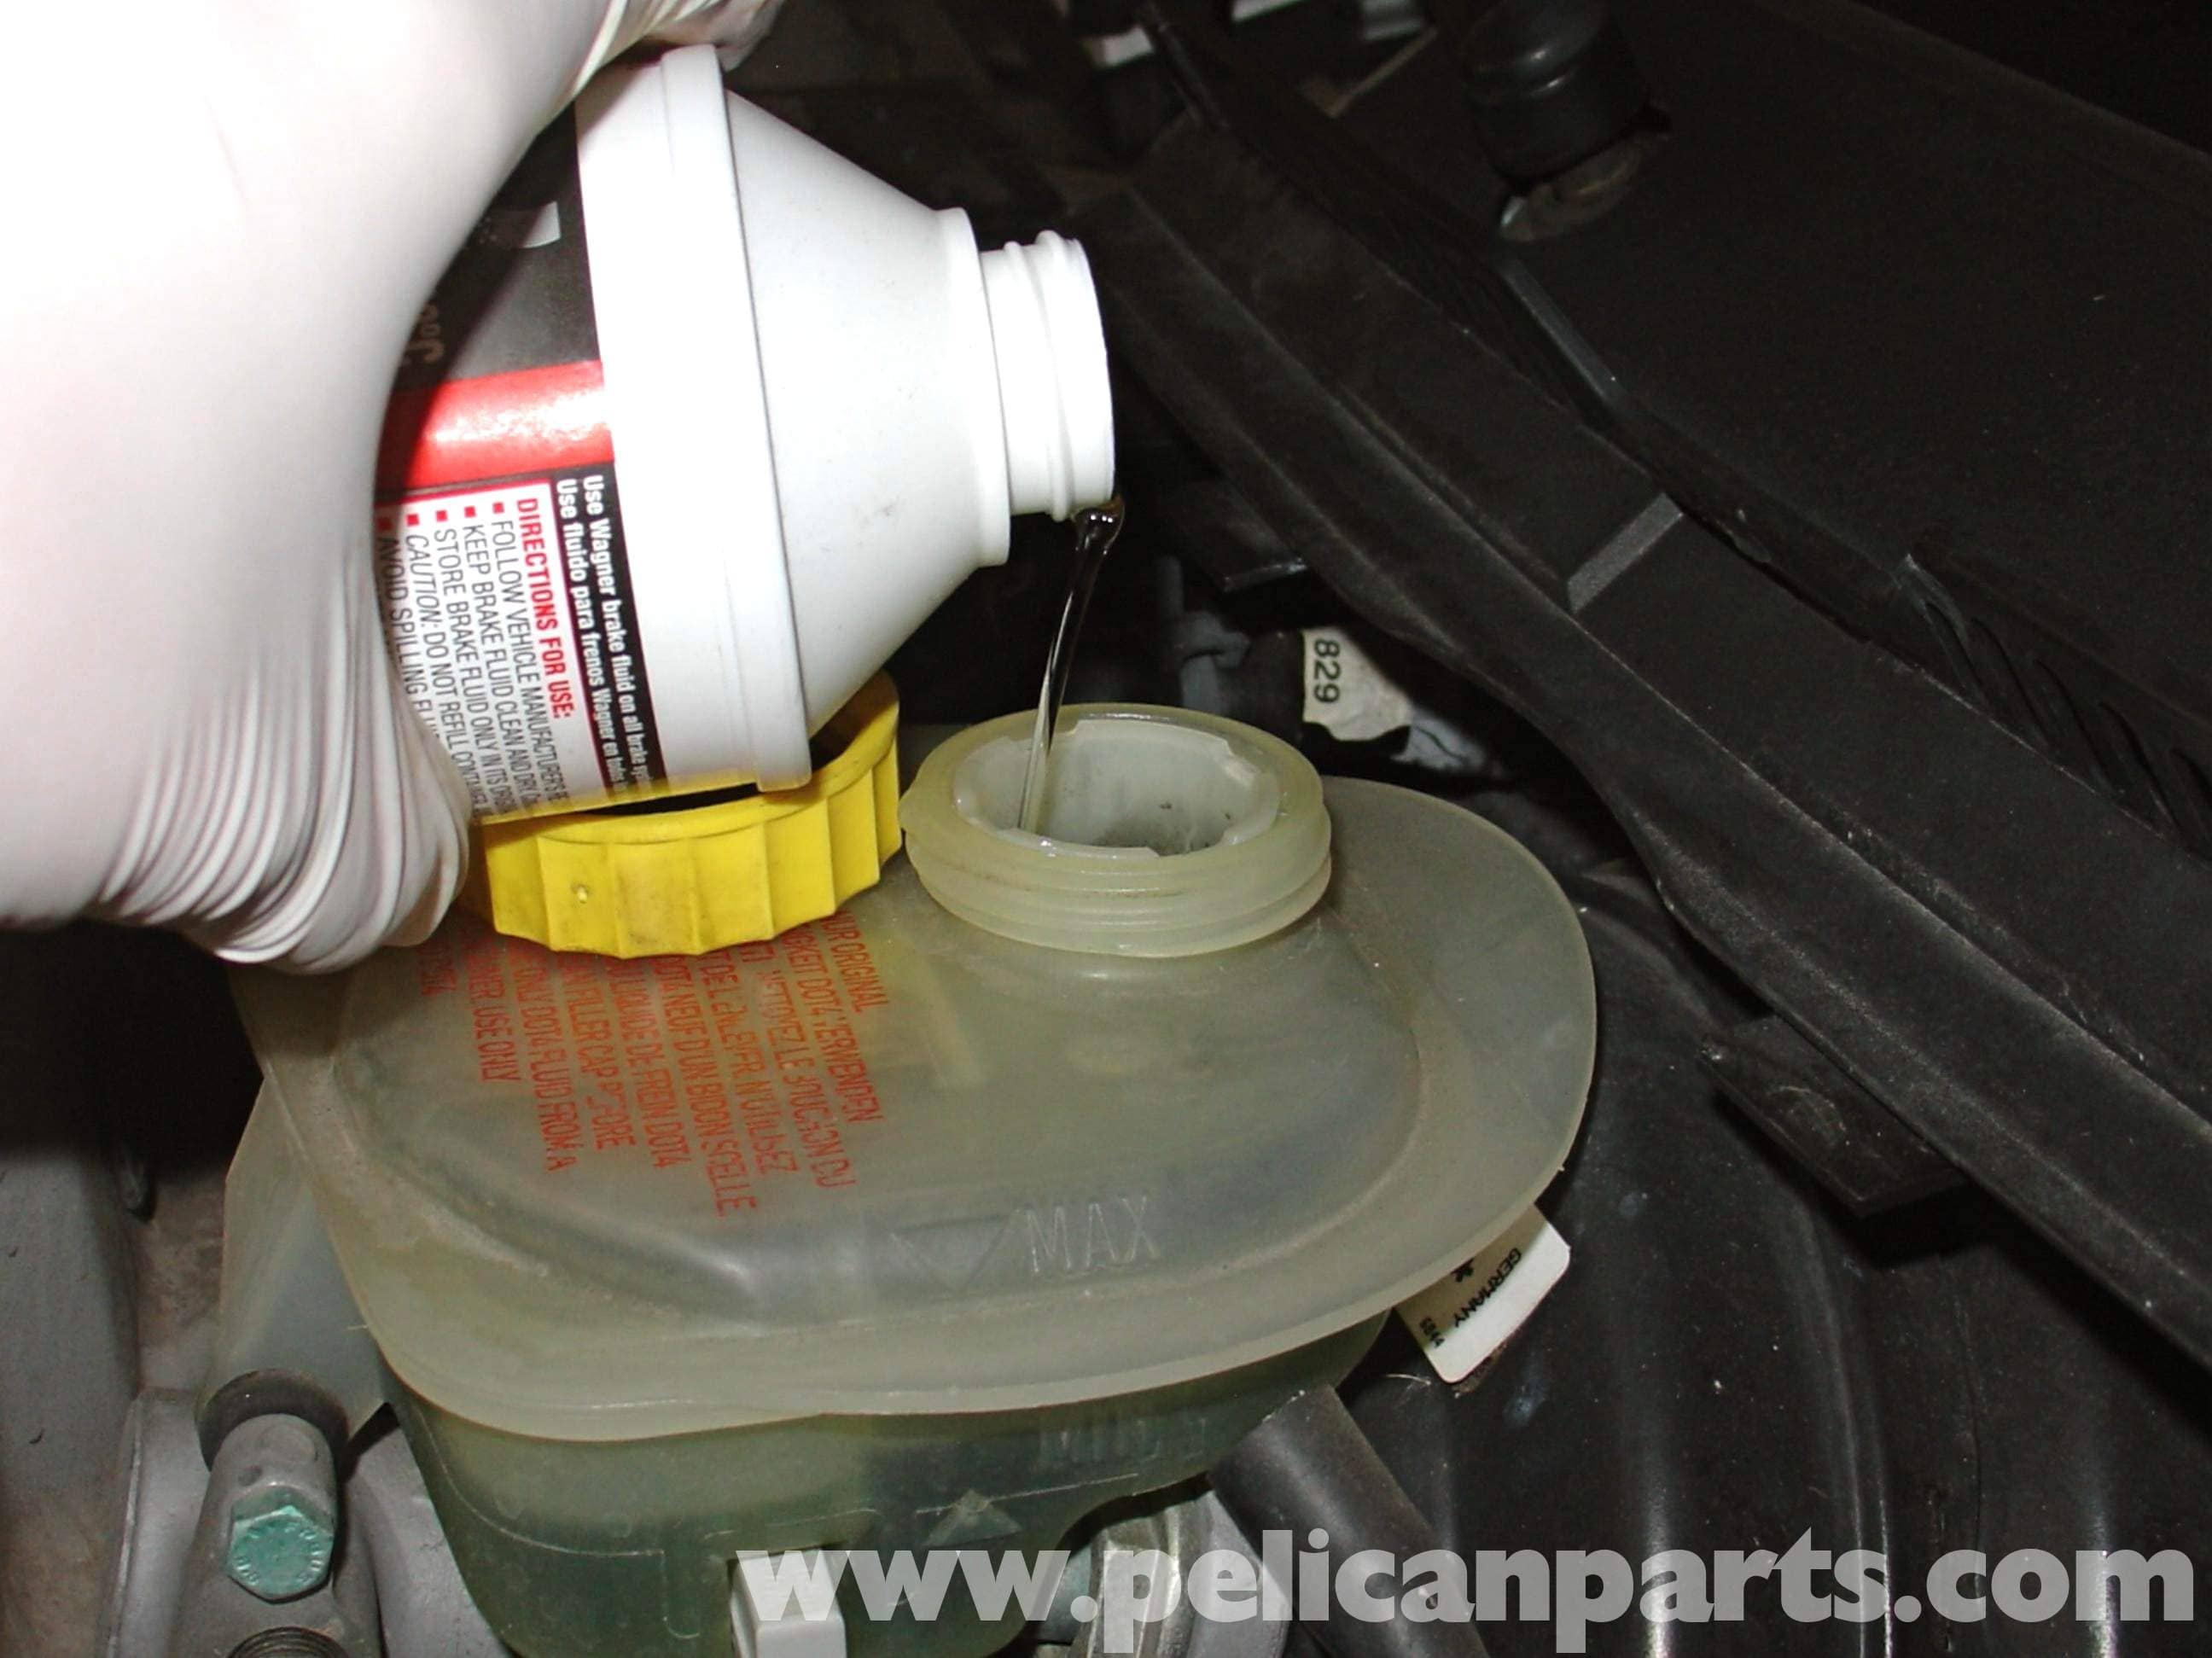 Audi A4 18t Volkswagen Brake Bleeding Golf Jetta Passat Water Heater Thermostat Waterheatertimer Org How To Wire Large Image Extra